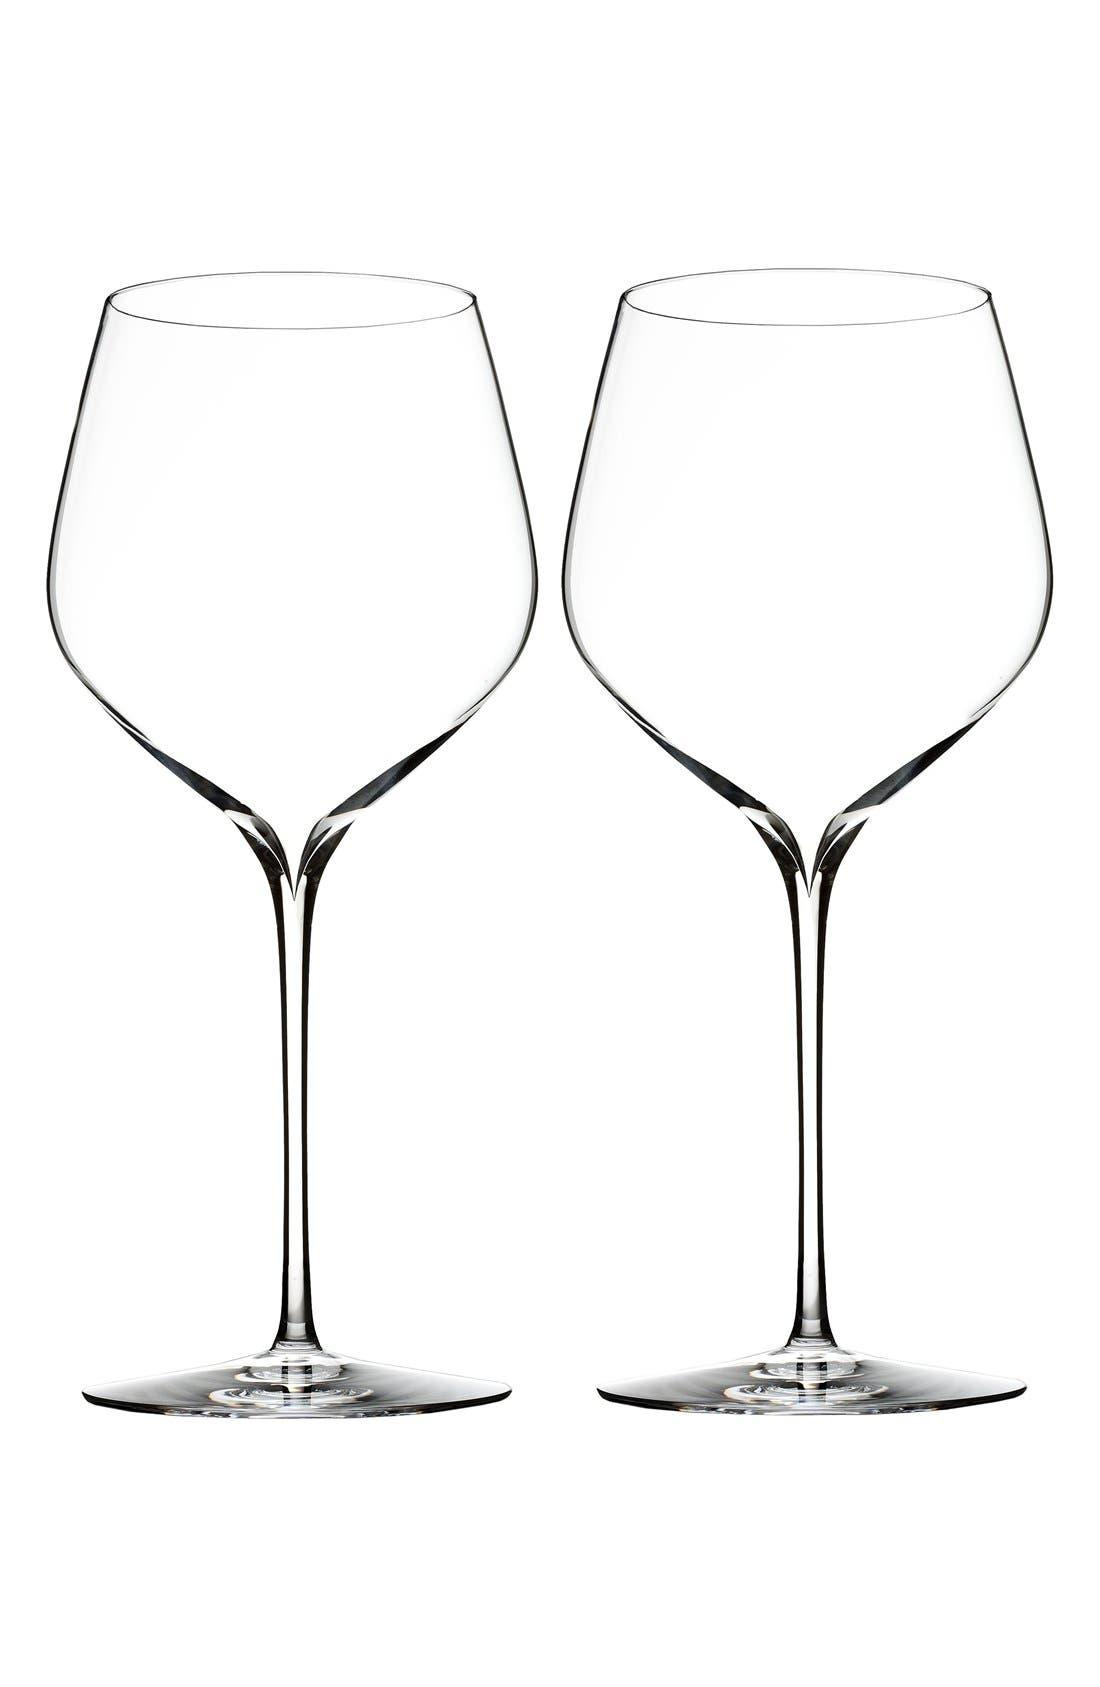 Main Image - Waterford 'Elegance' Fine Crystal Cabernet Sauvignon Glasses (Set of 2)